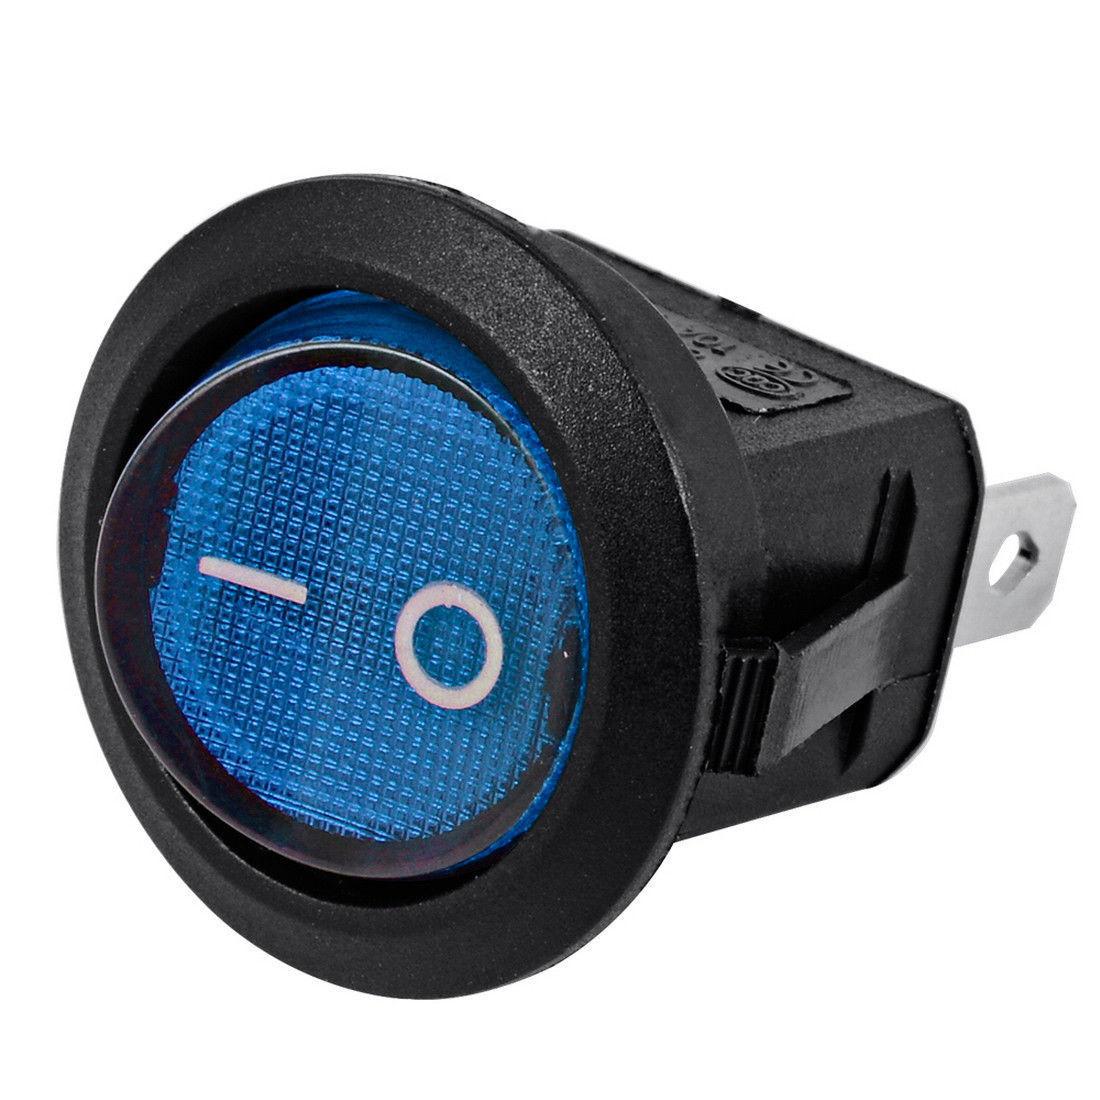 5x Auto Car Blue Light On Off 3 Pin Spst Round Button Dot Boat Of 5 12 Volt Prong Led Rocker Switch Toggle 12v